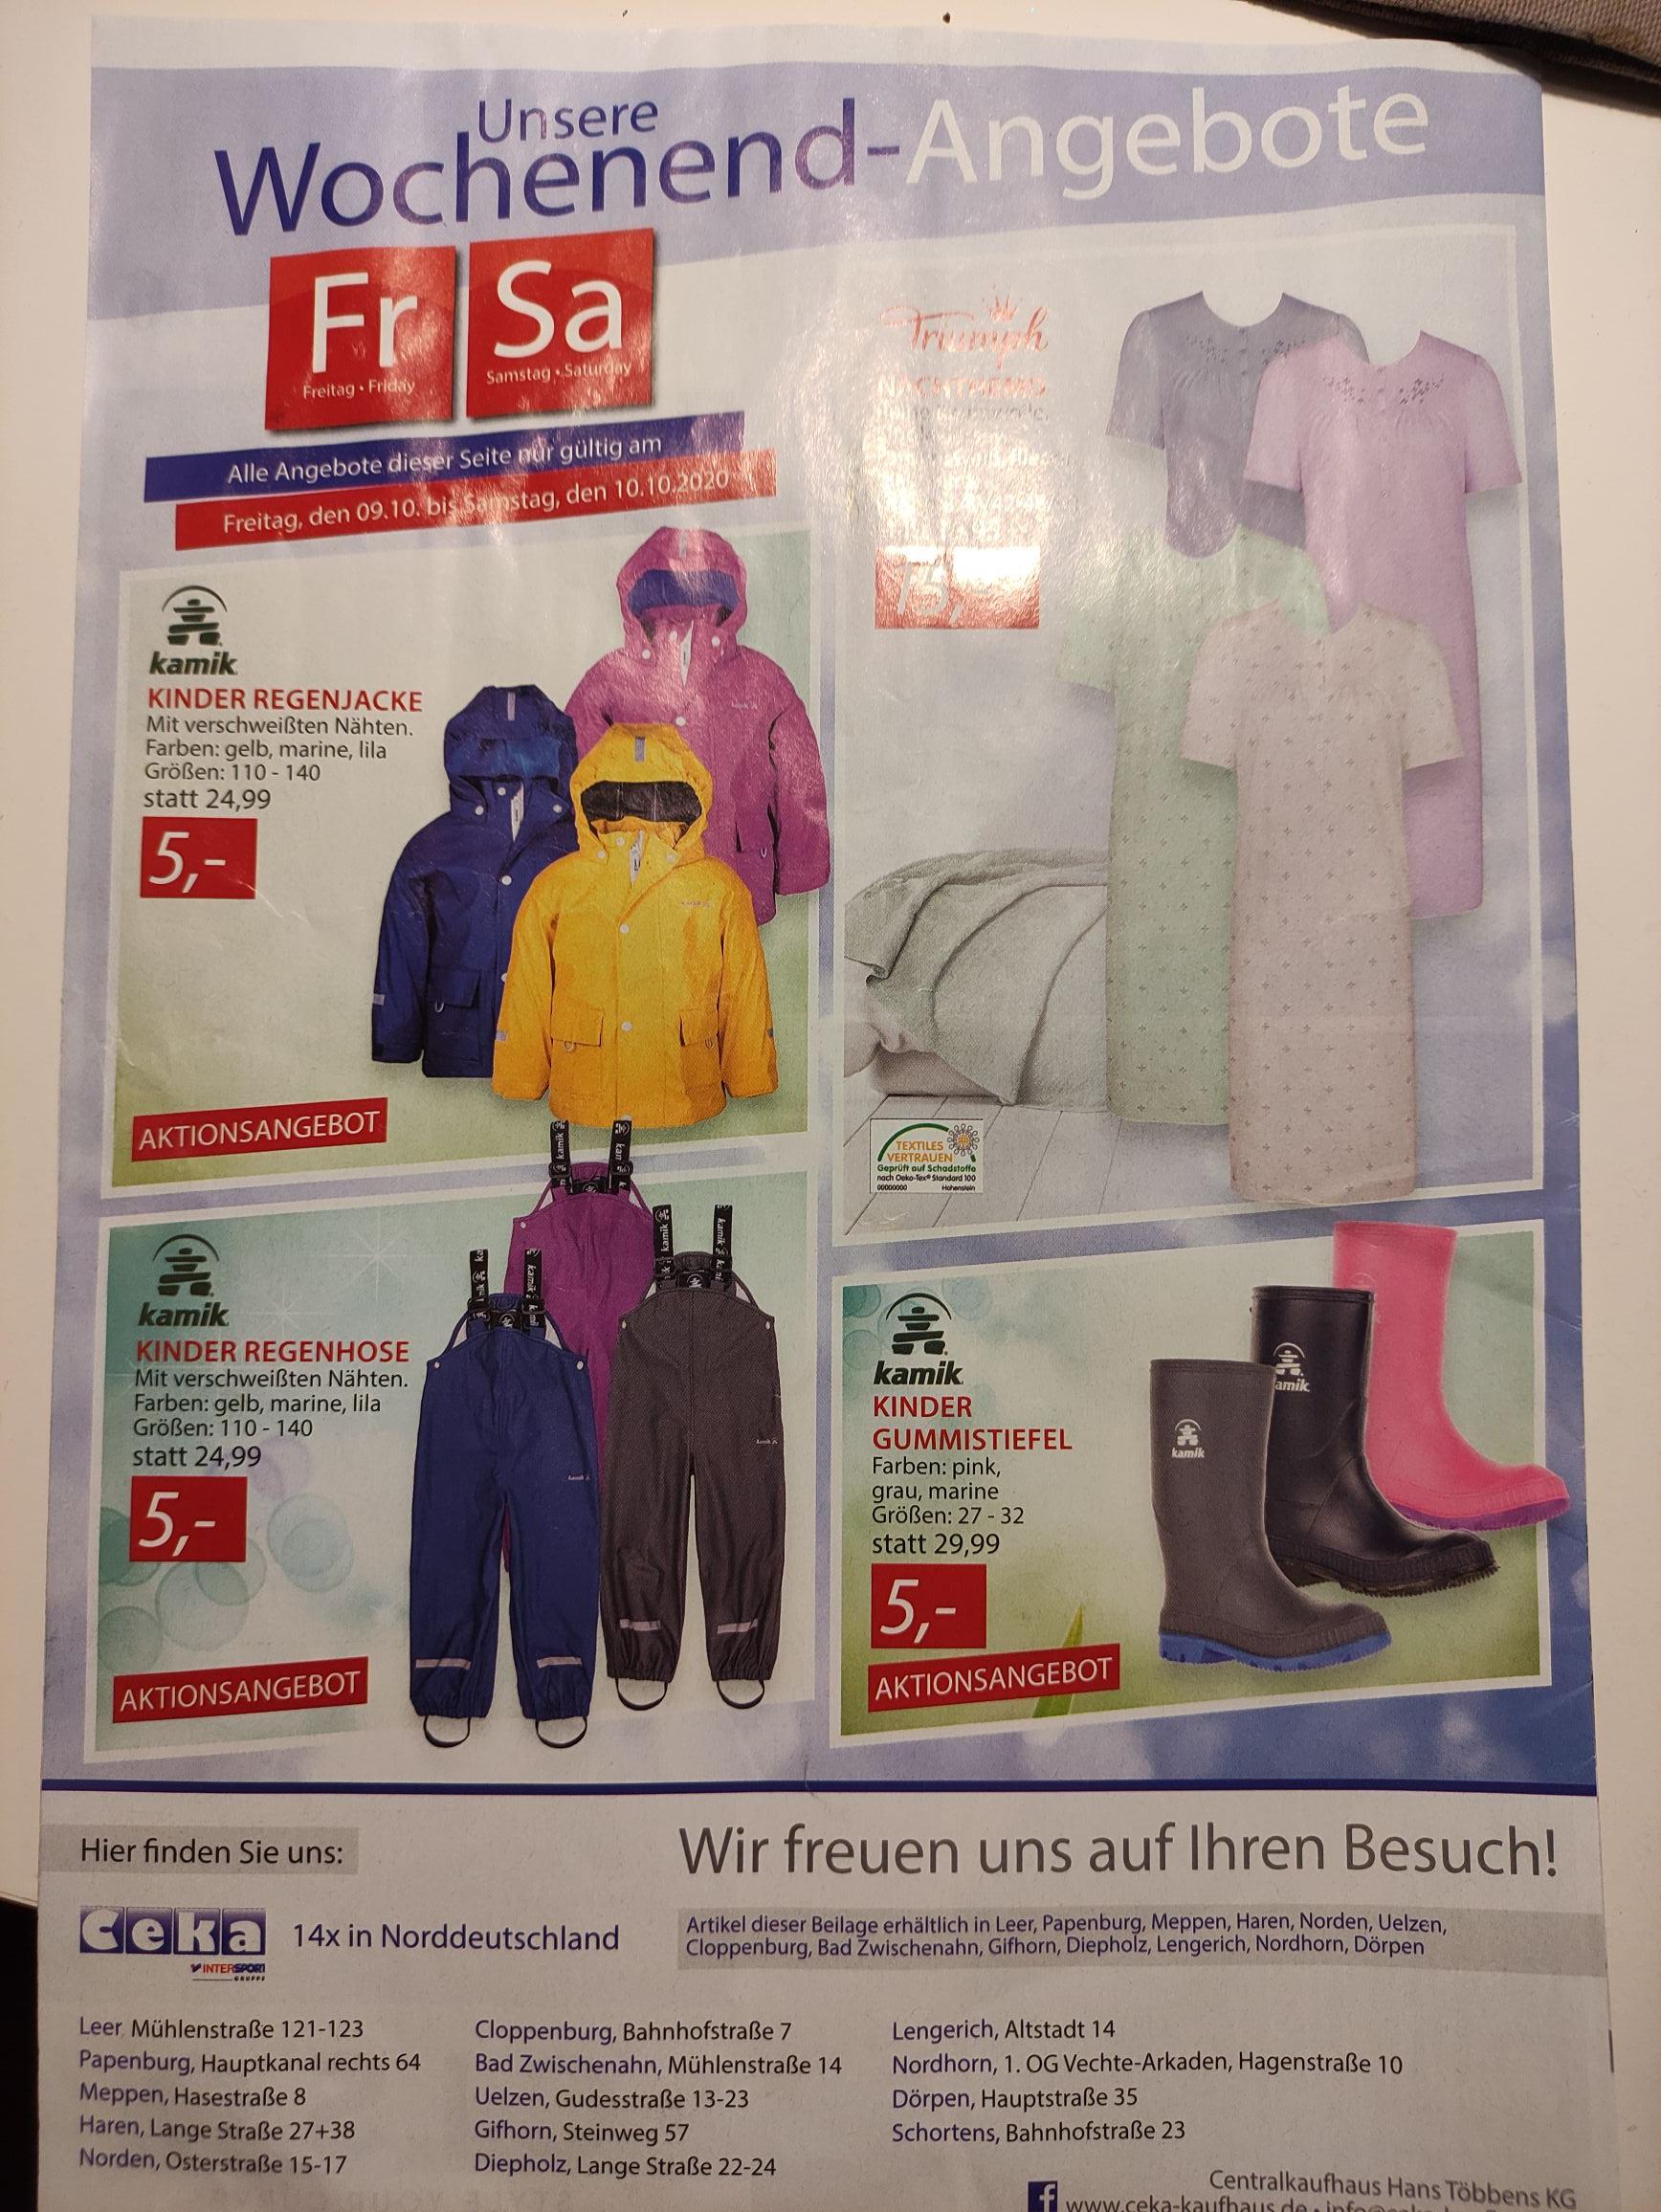 *Lokal Leer* Kamik Regenkleidung für Kinder, Regenjacke, Regenhose, Gummistiefel